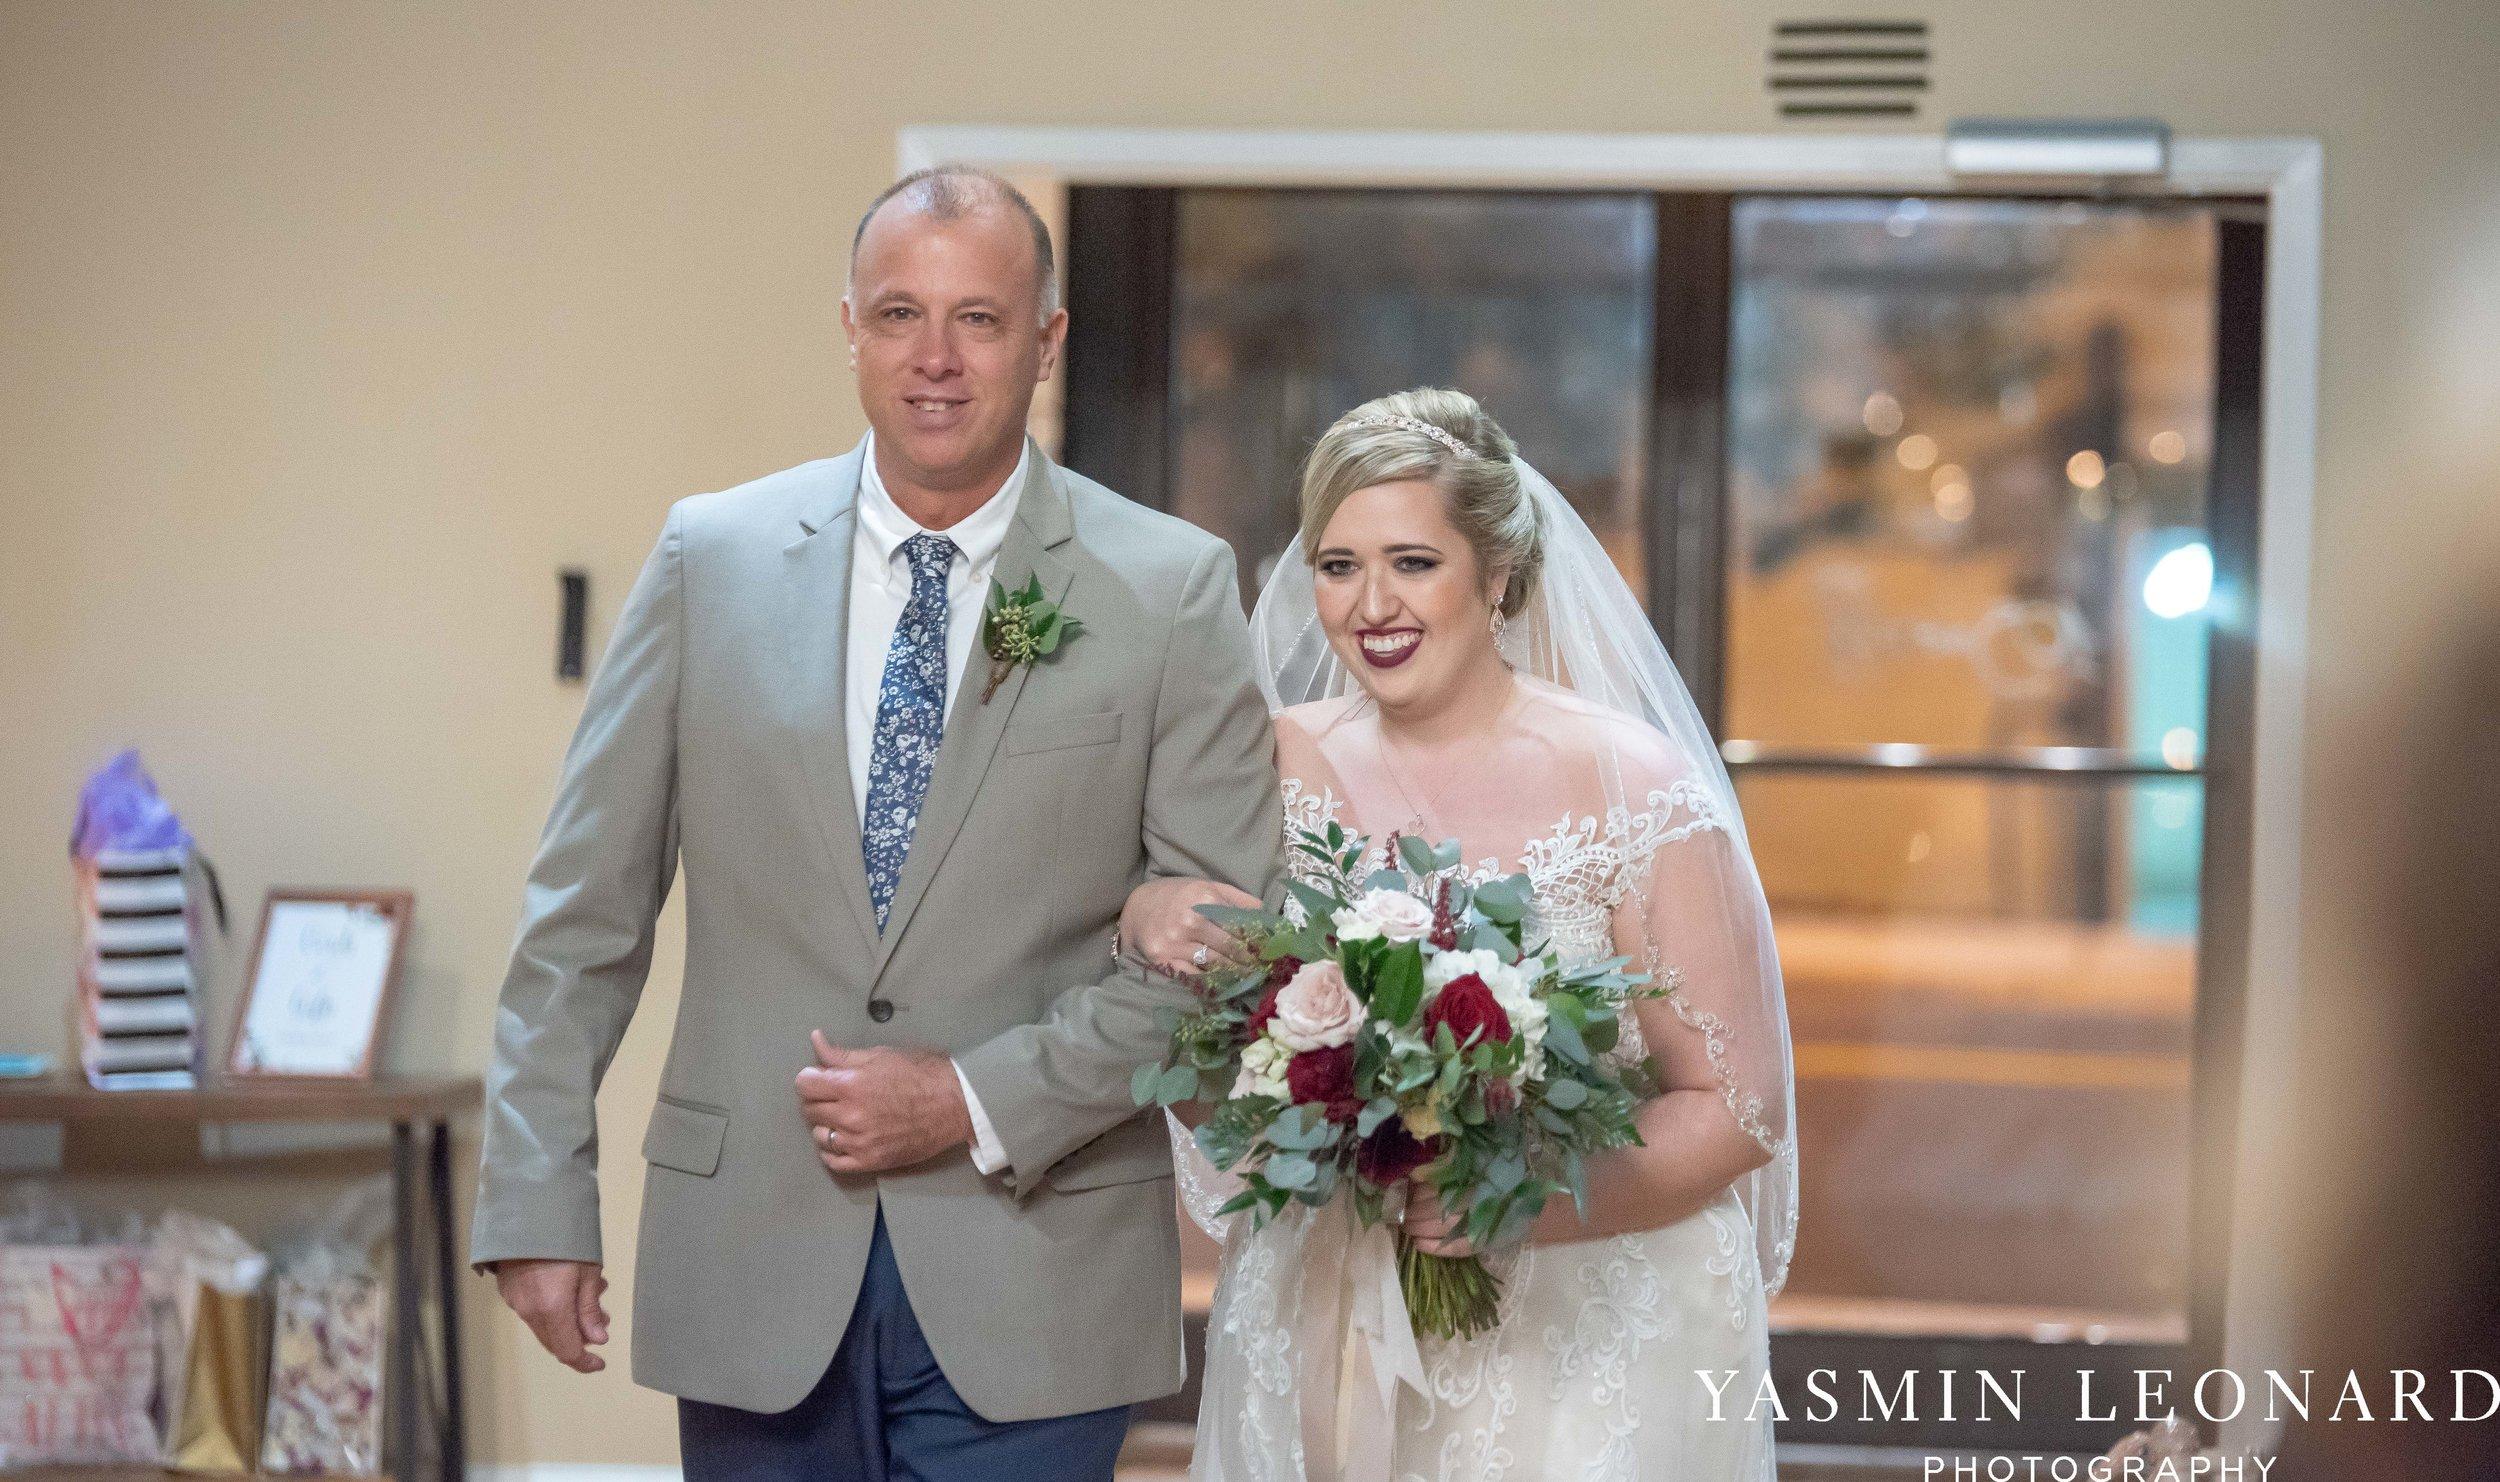 Rebekah and Matt - 105 Worth Event Centre - Yasmin Leonard Photography - Asheboro Wedding - NC Wedding - High Point Weddings - Triad Weddings - Winter Wedding-23.jpg